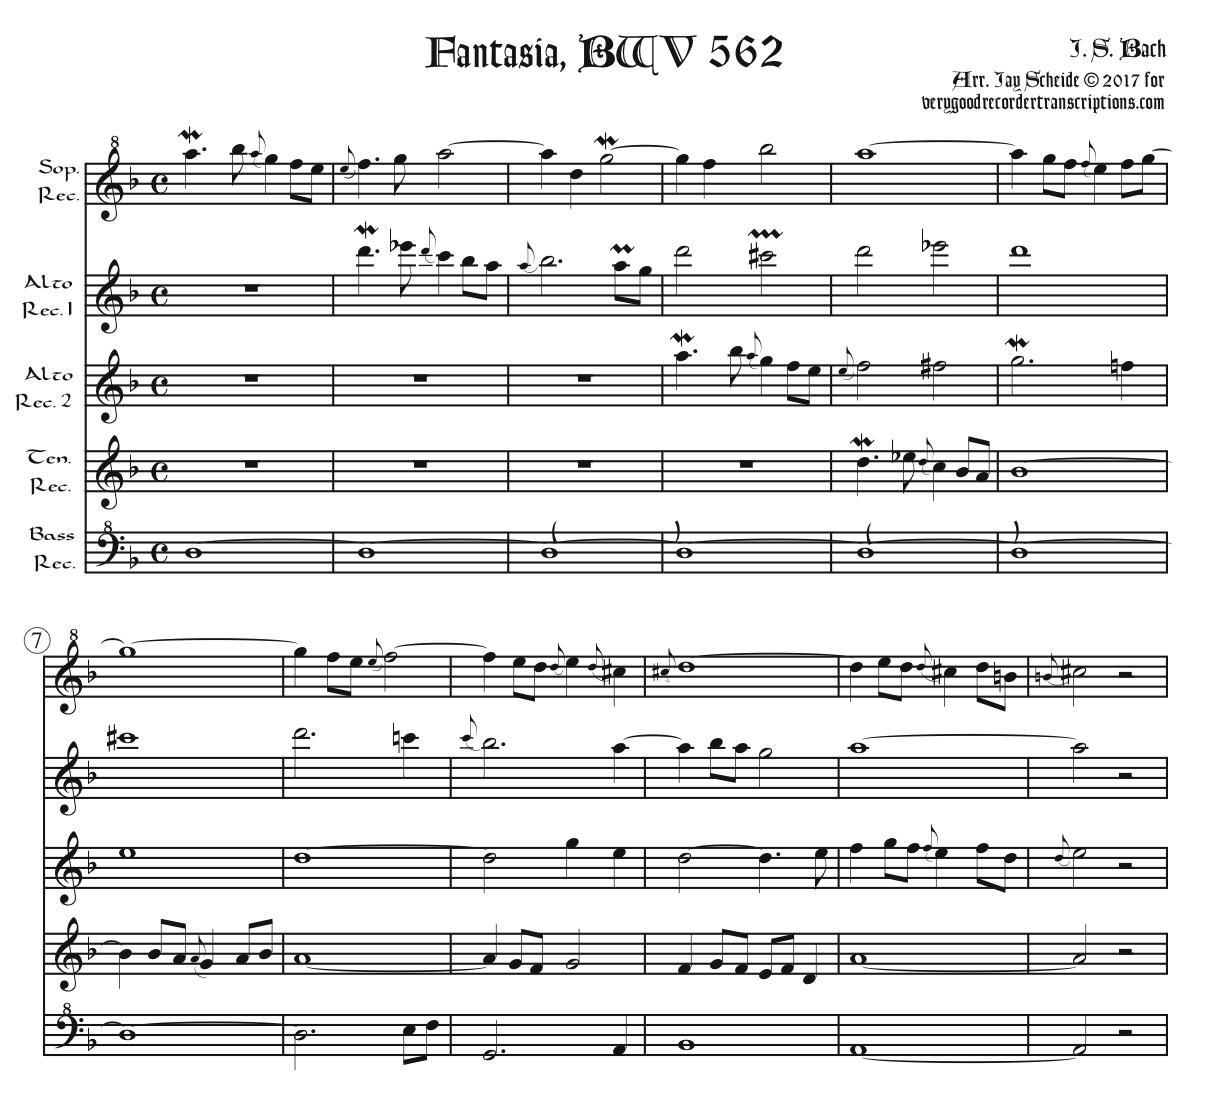 Fantasia BWV 562, arr. for recorder quintet